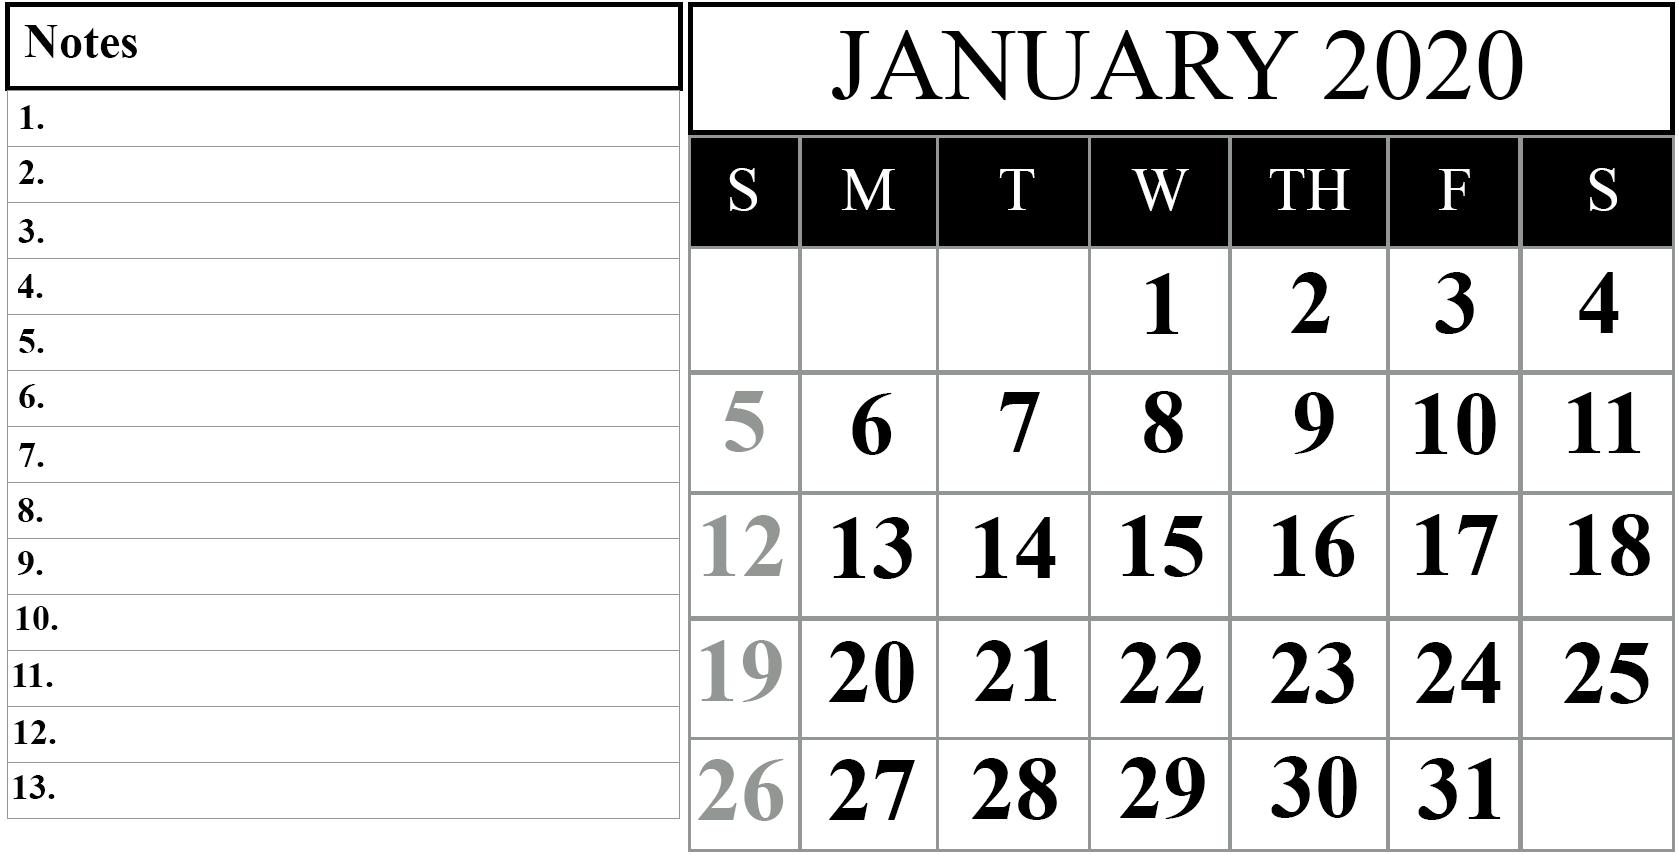 January 2020 Printable Calendar Template #2020Calendars